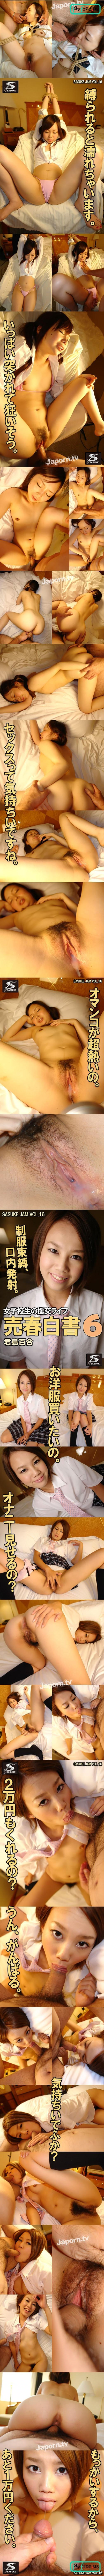 [SSKJ 016] サスケジャム Vol.16 売春白書 006 : 菅野すみれ,君島百合 菅野すみれ 君島百合 SSKJ